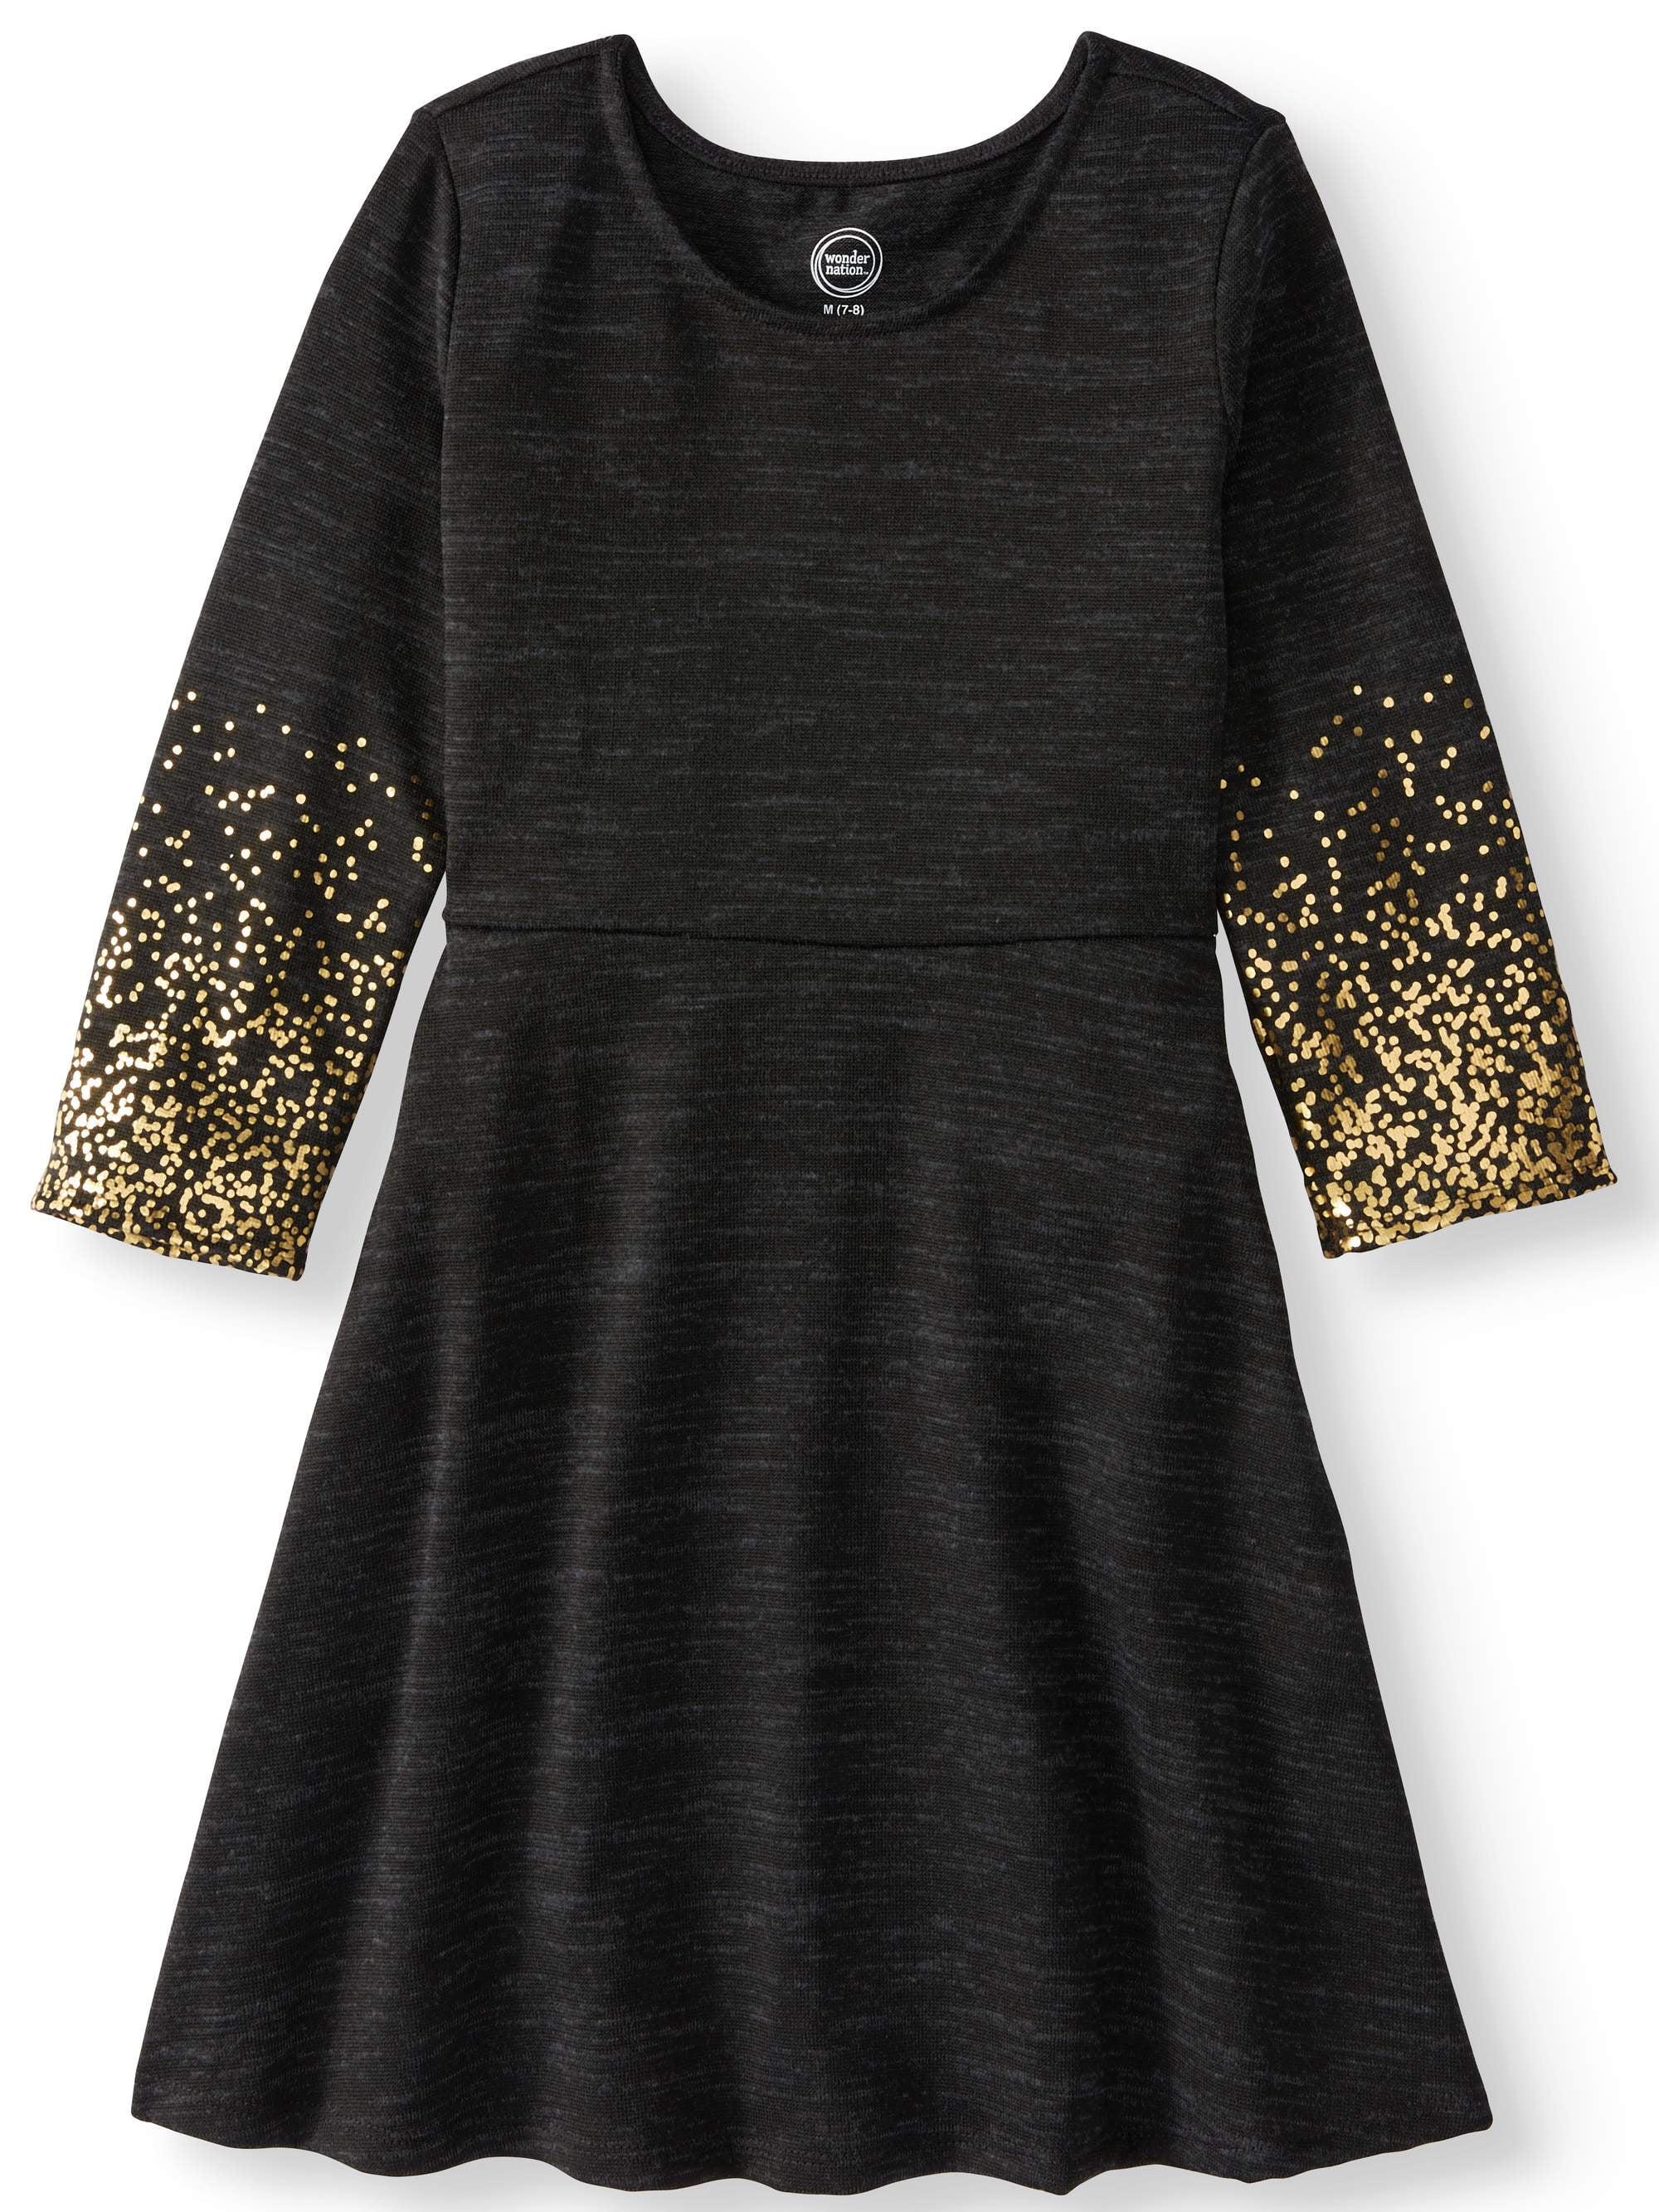 Ombre Long Sleeve Sweater Knit Dress (Little Girls and Big Girls)